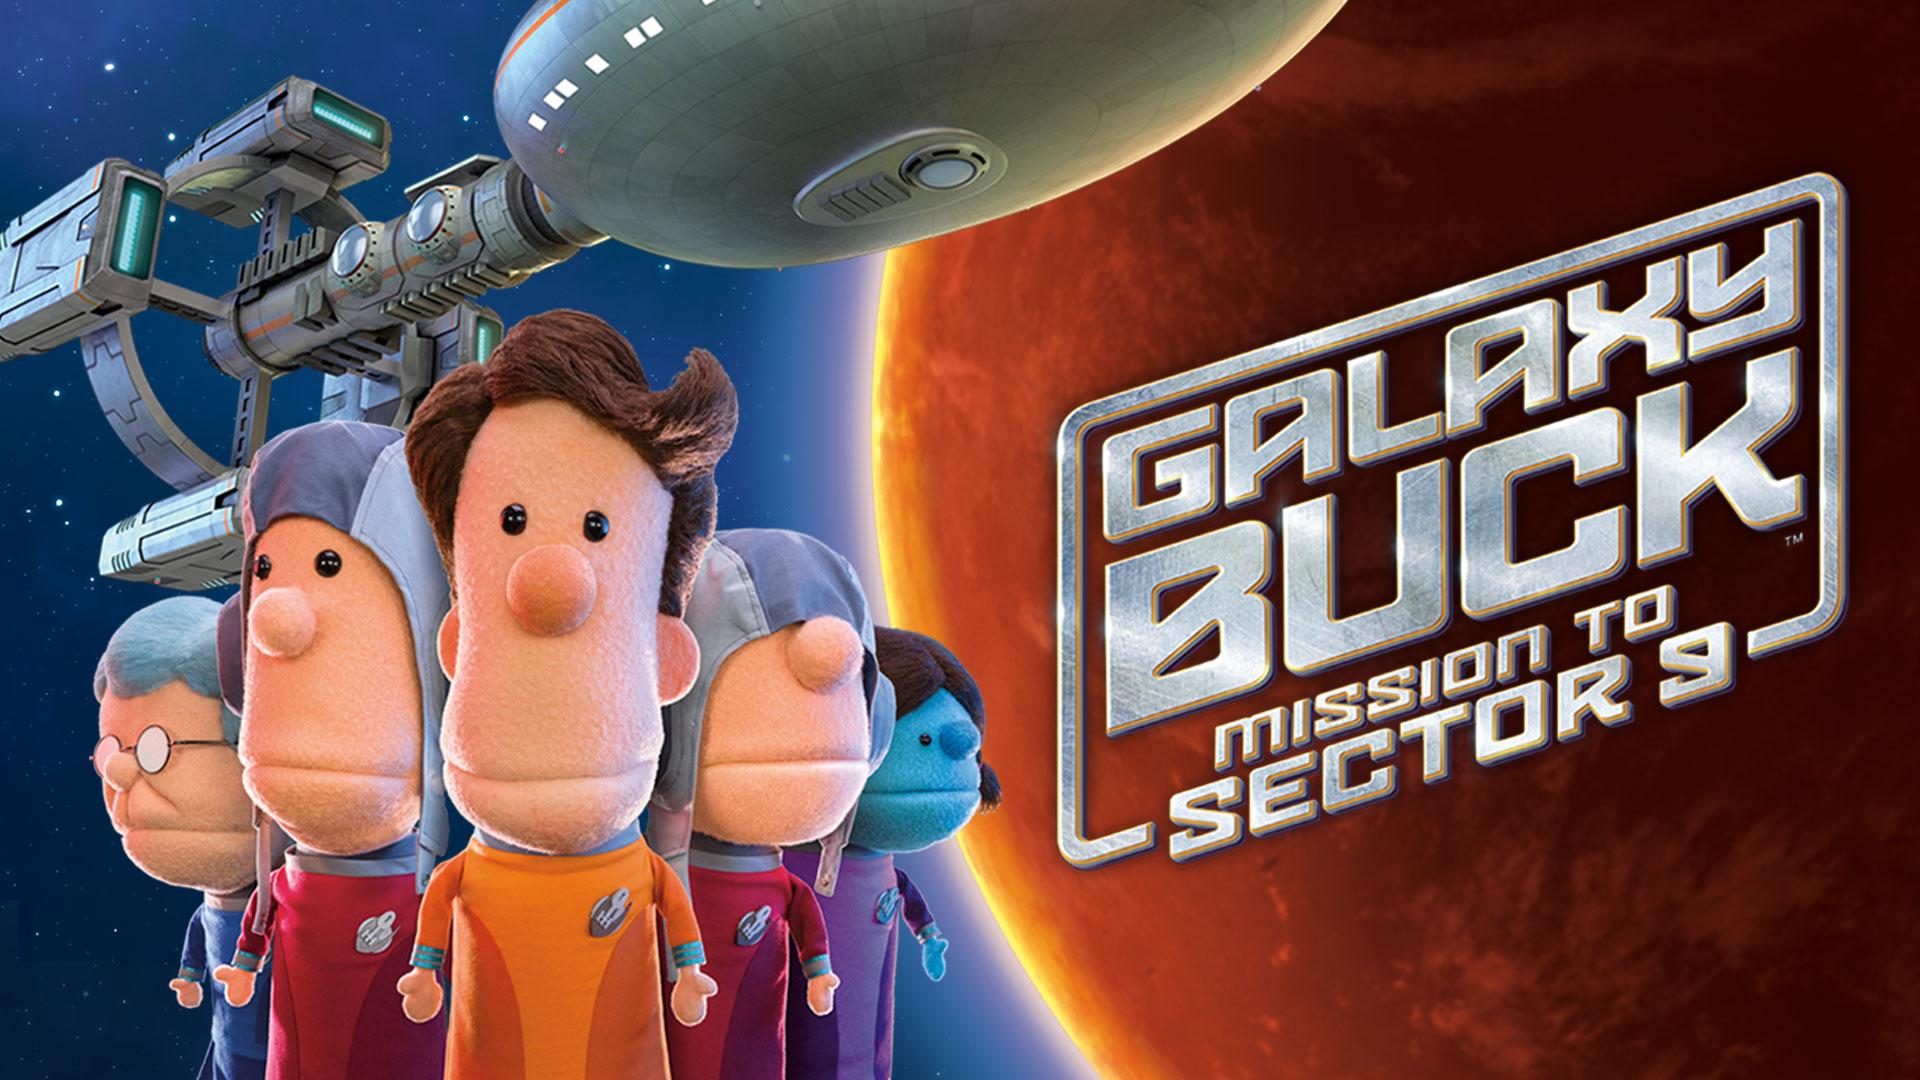 Galaxy buck series image